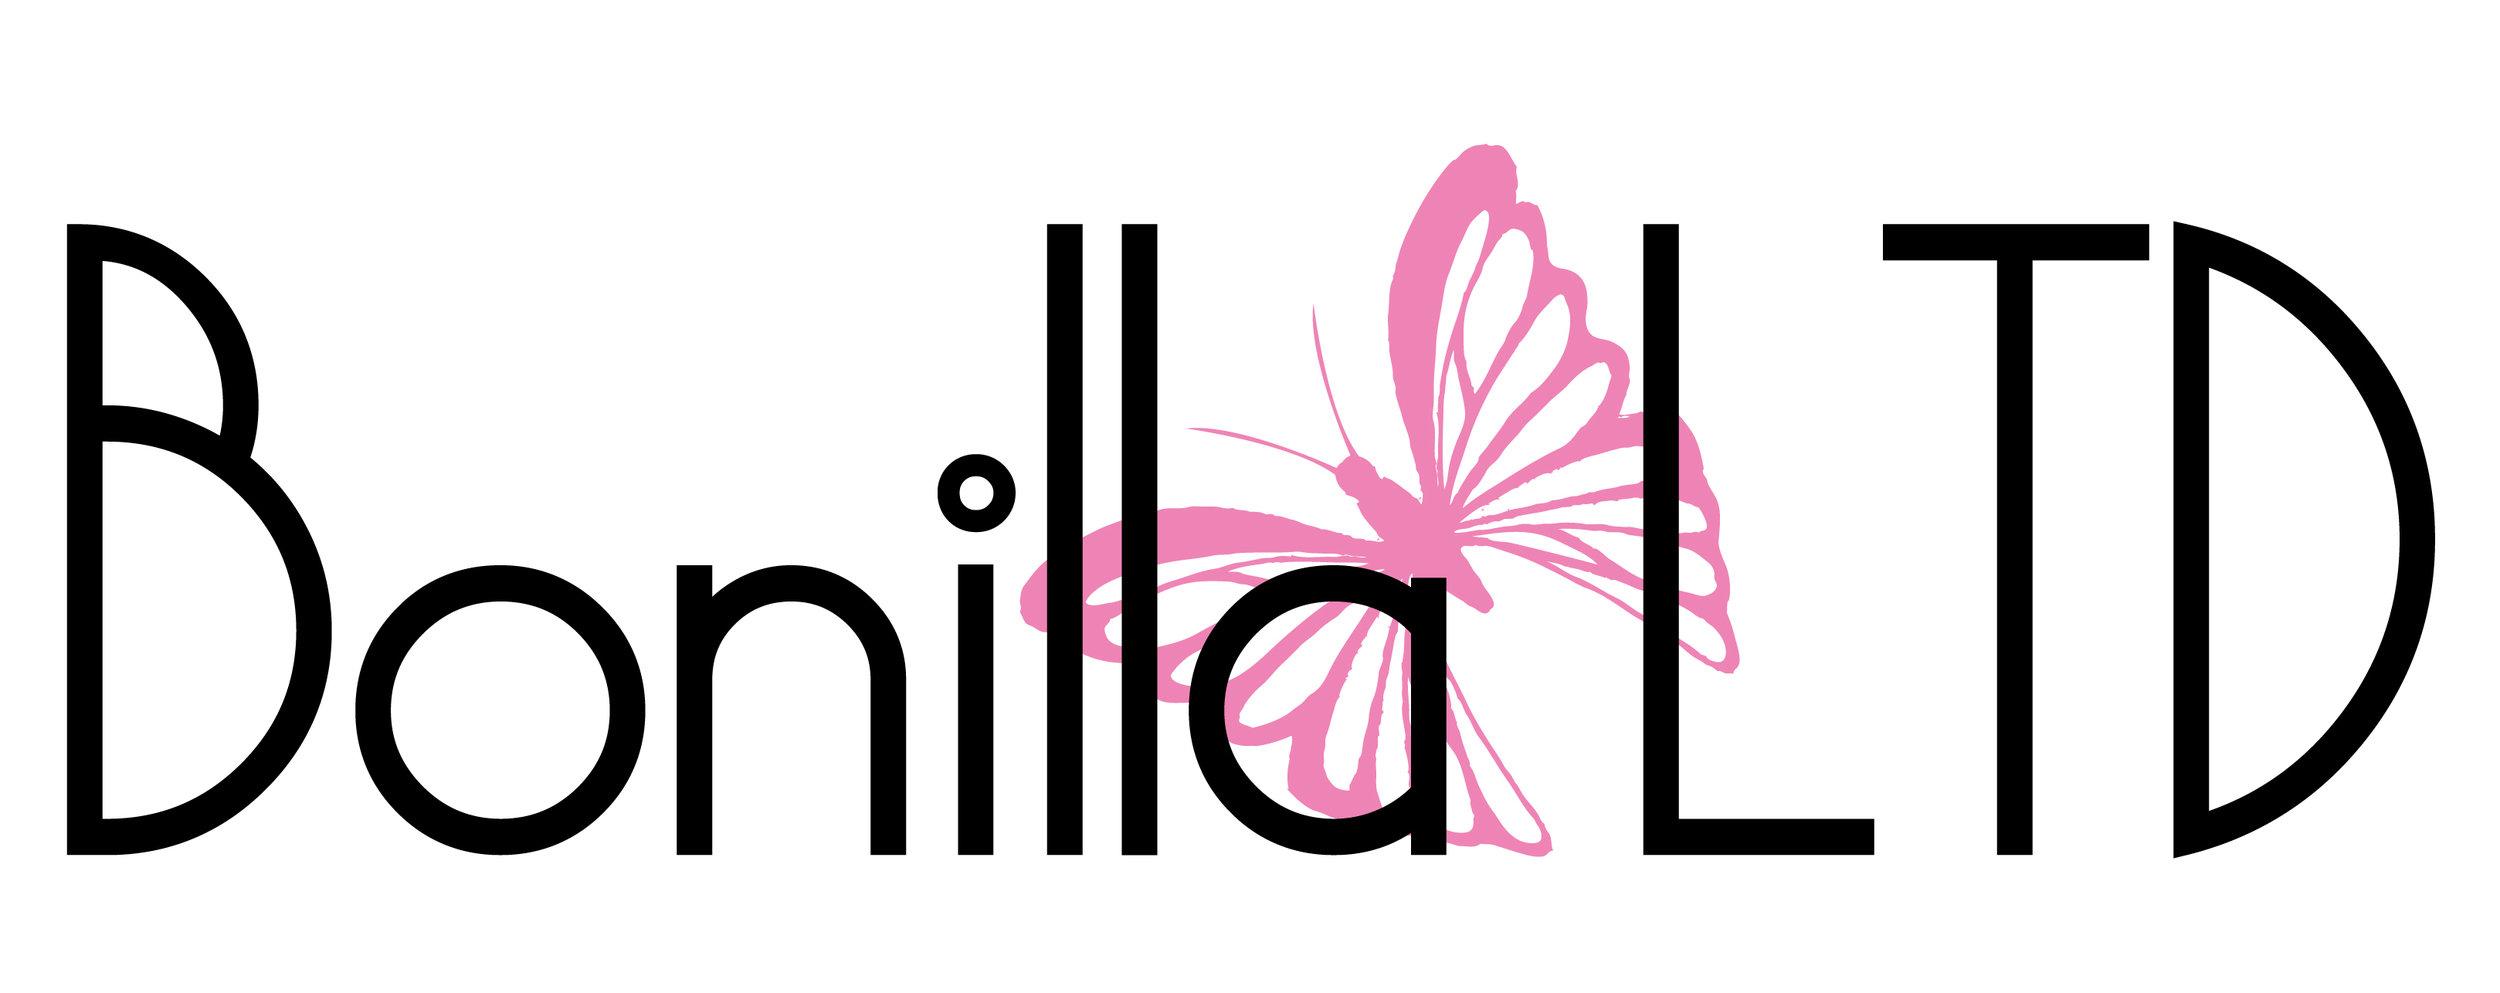 BonillaLTD-LOGO-01.jpg